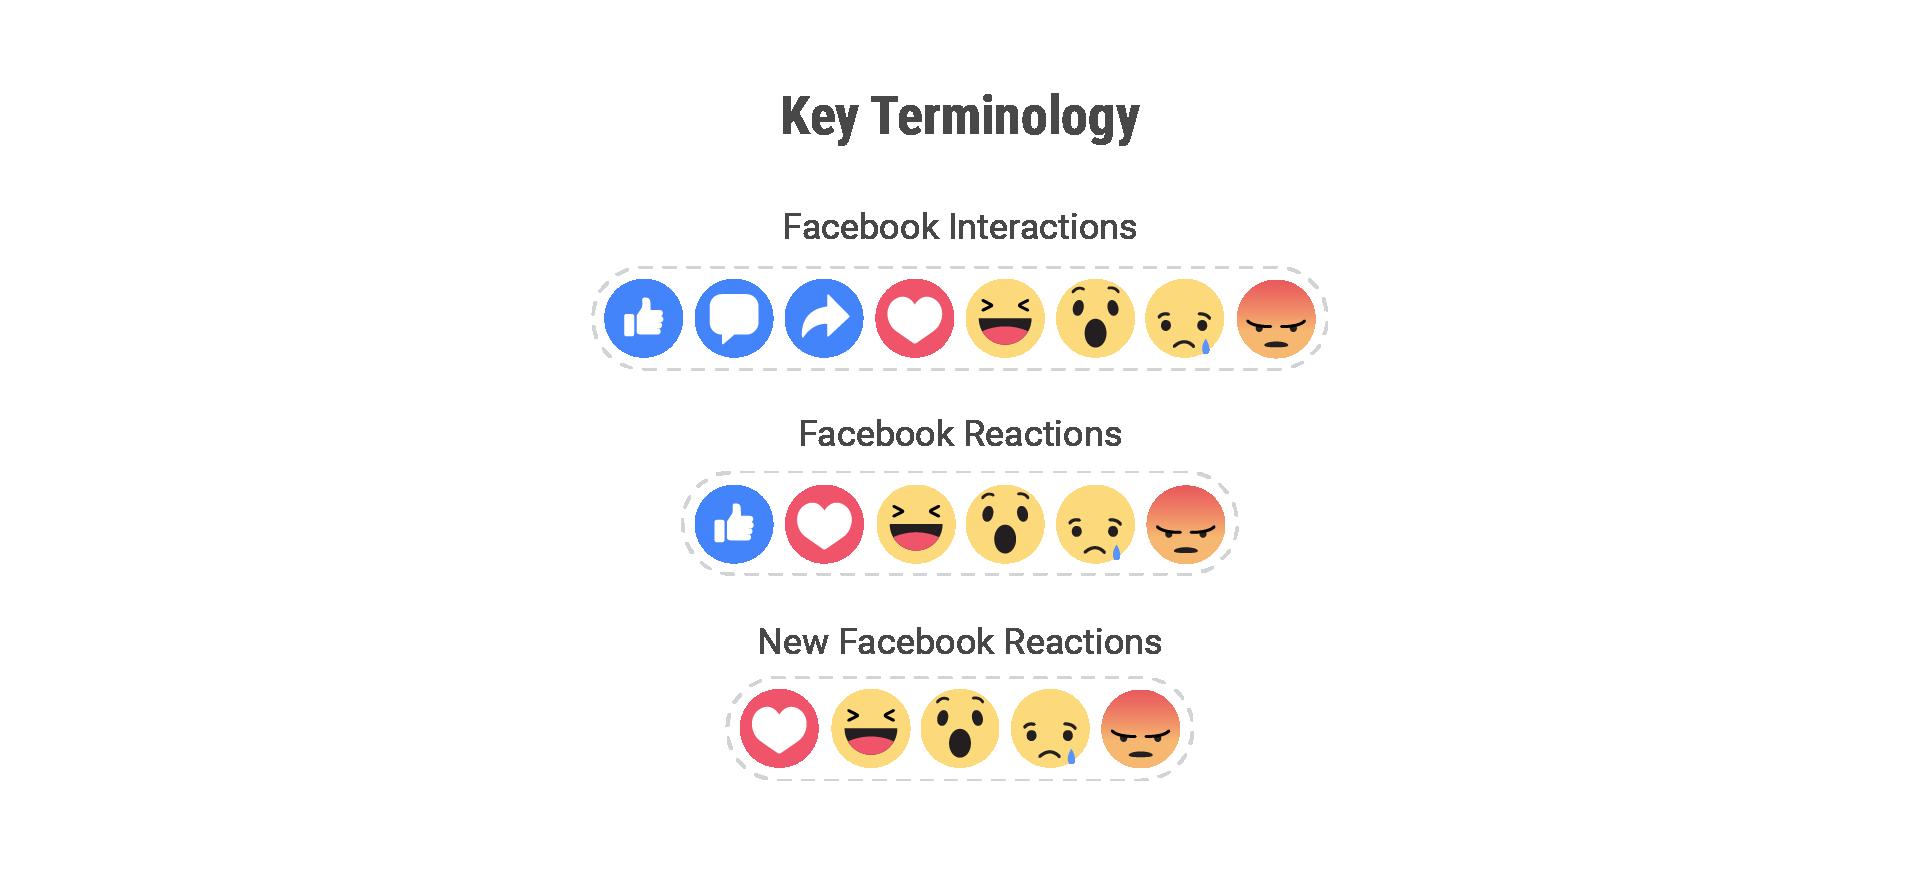 Facebook Interactions terminology